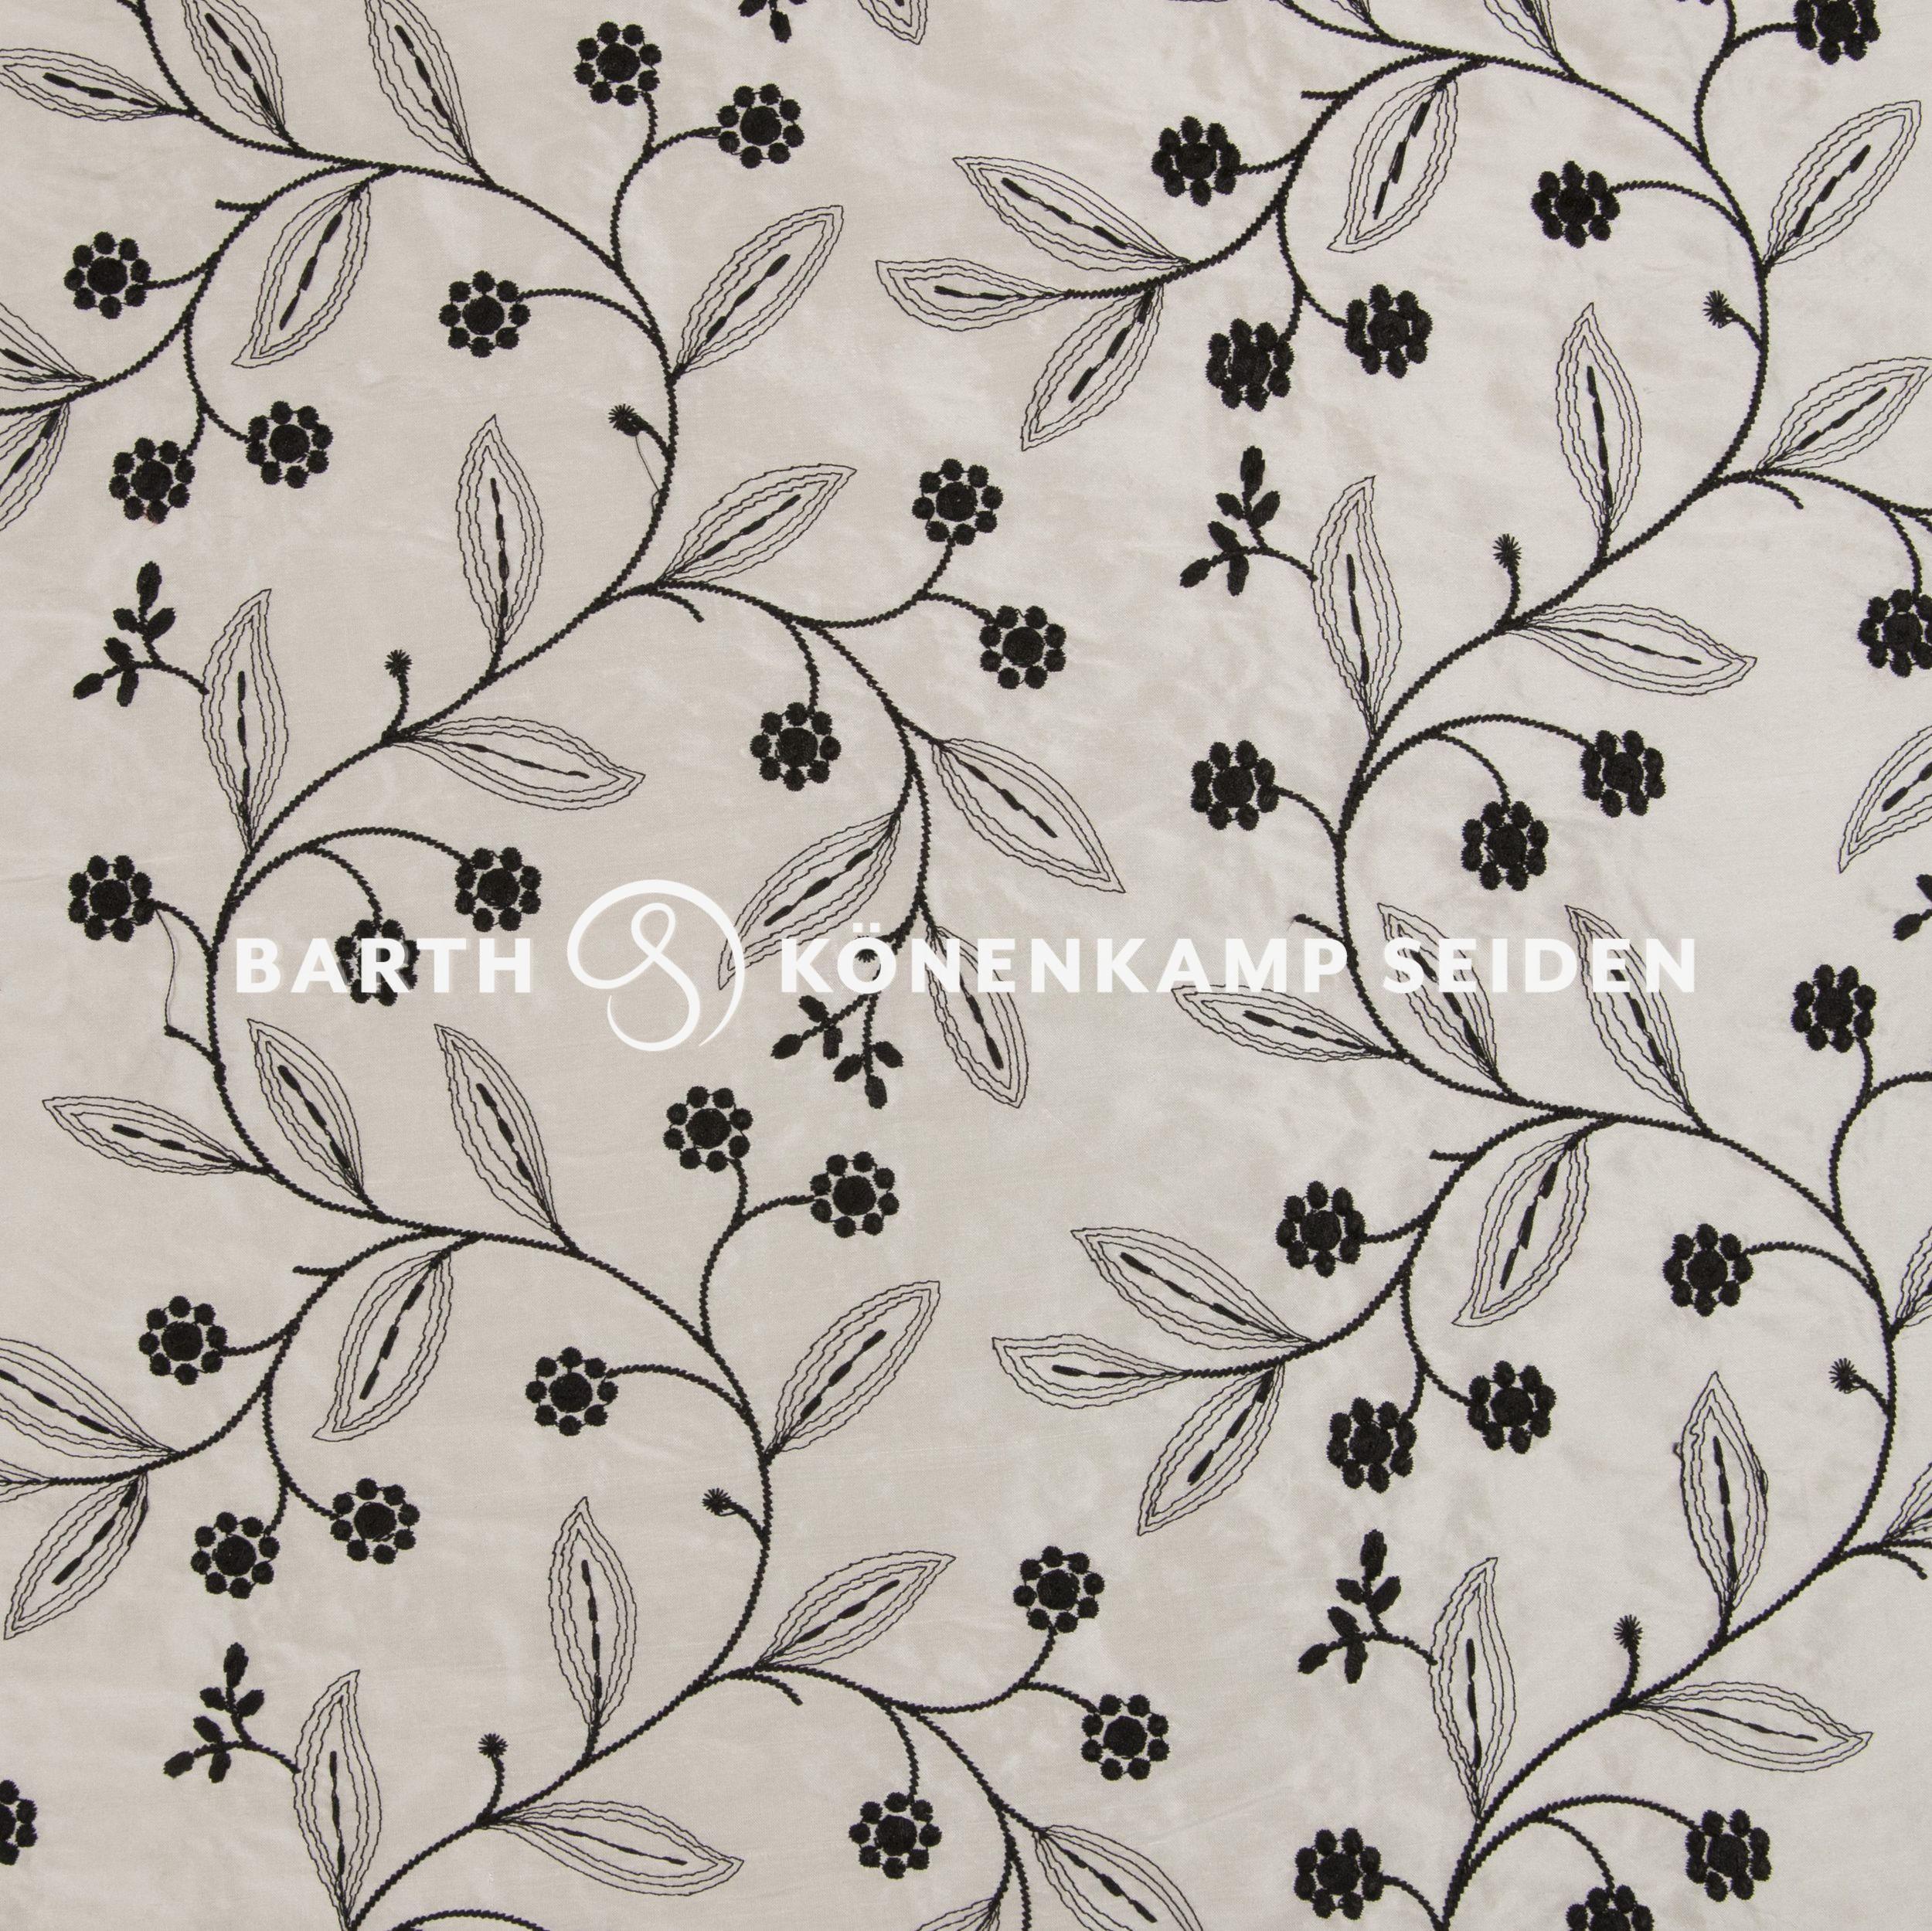 3065M-108 / Doupion silk Doupion silk with ornate embroidery